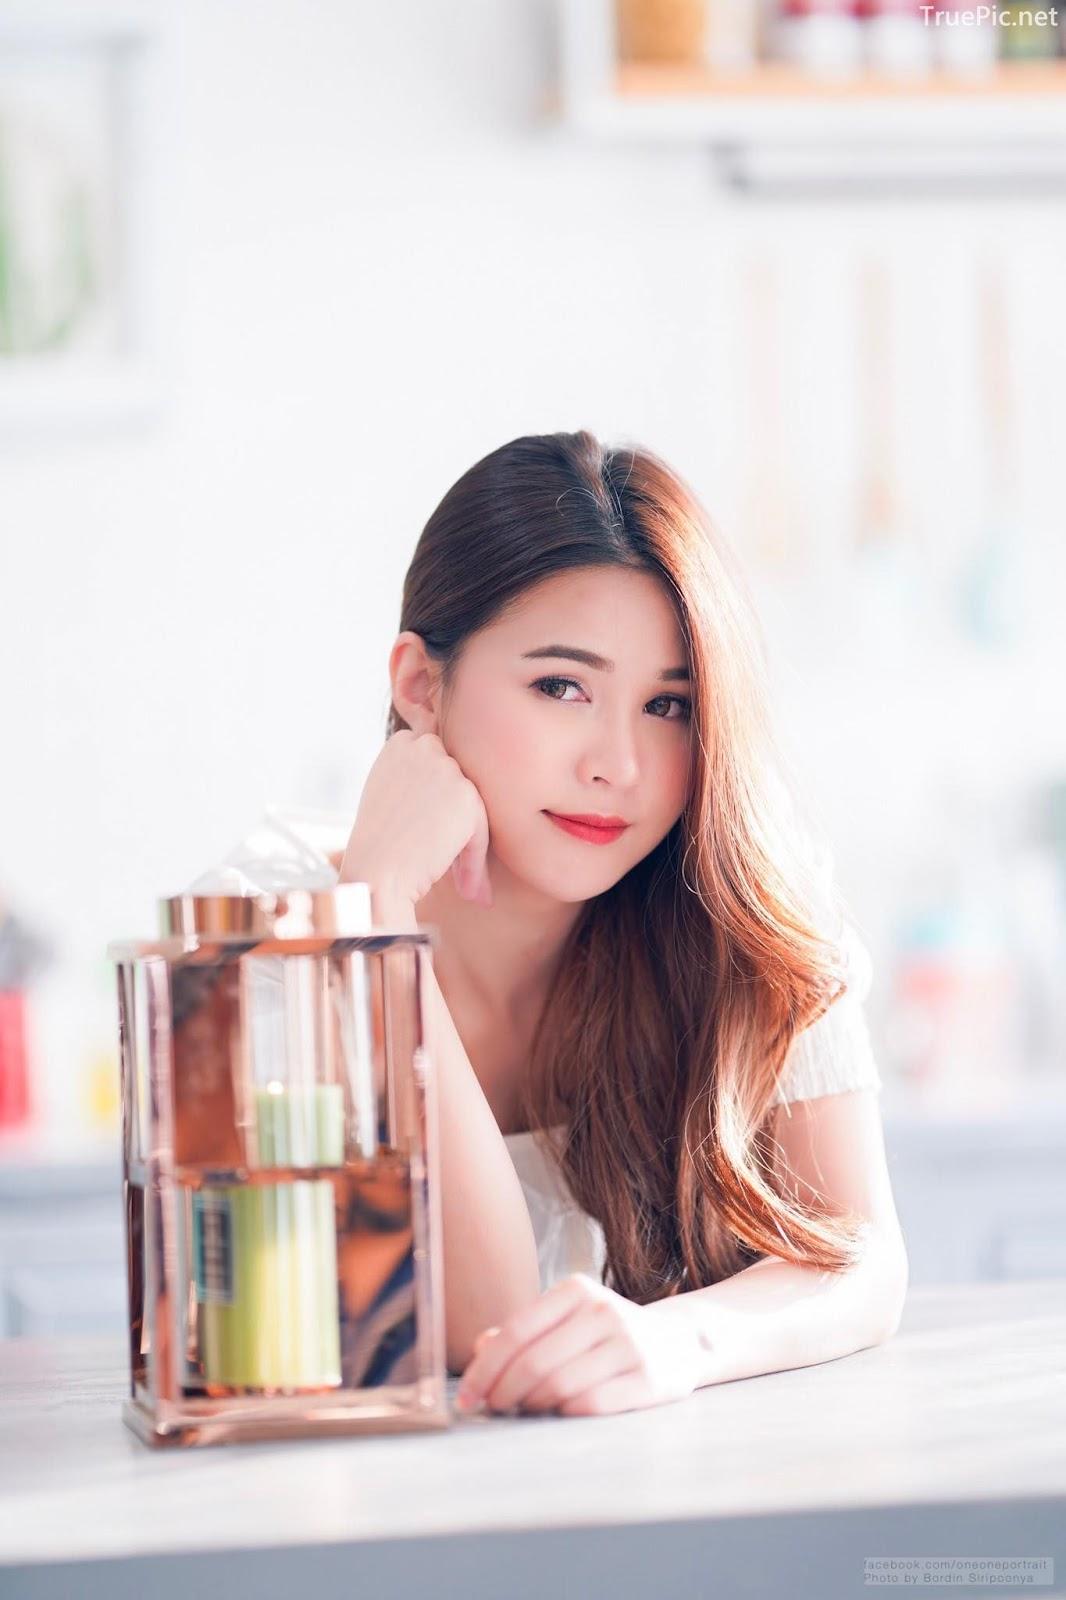 Thailand cute model Supansa Yoopradit (Lorpor) - Lovely smile girl - Picture 7